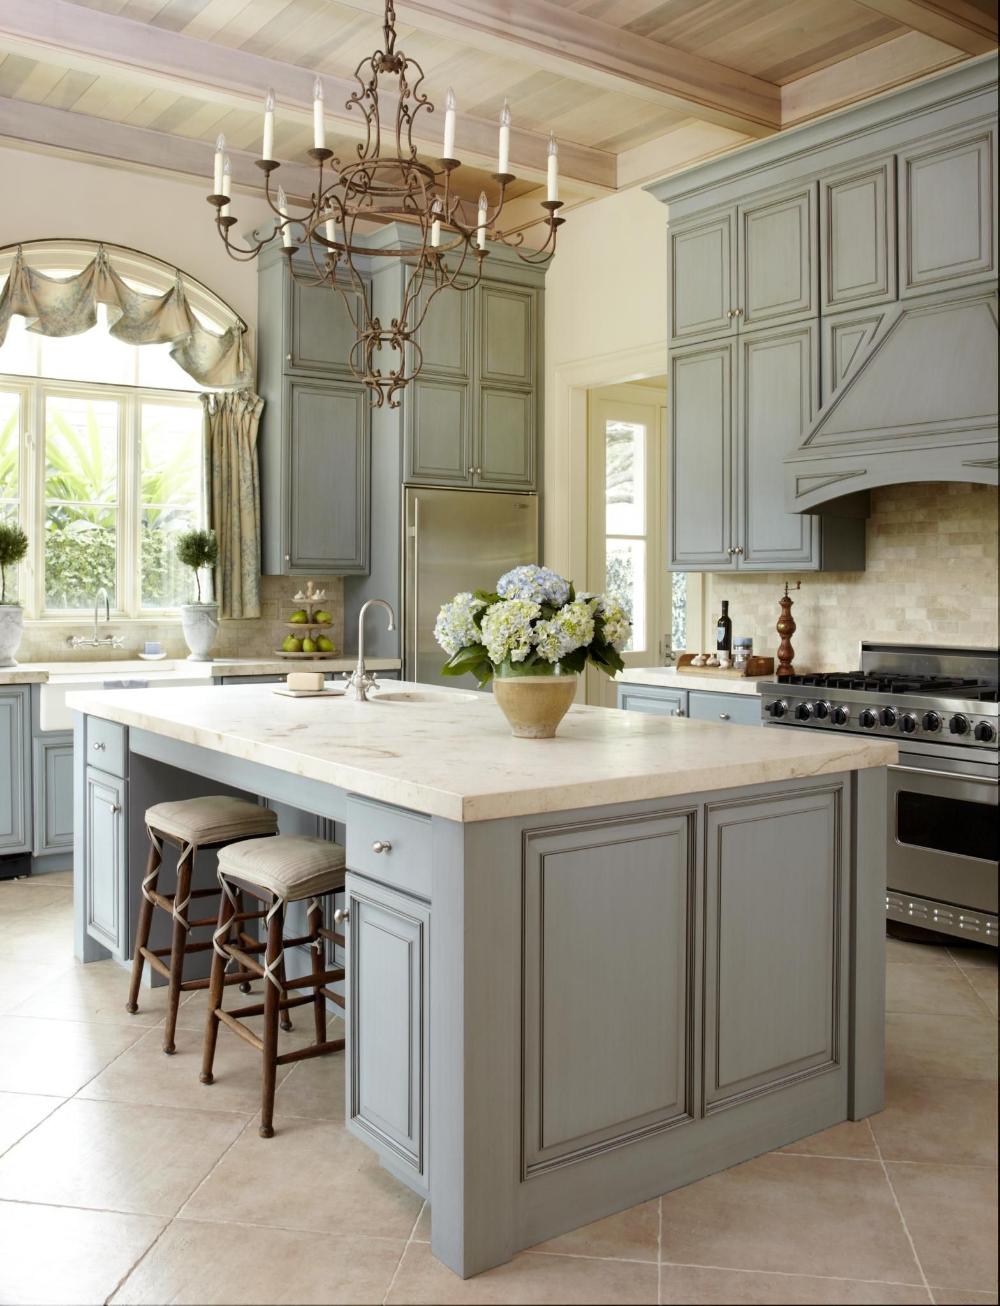 Charming Ideas French Country Decorating Kitchen Pinterest Within Ki Designs Decor Kitchens